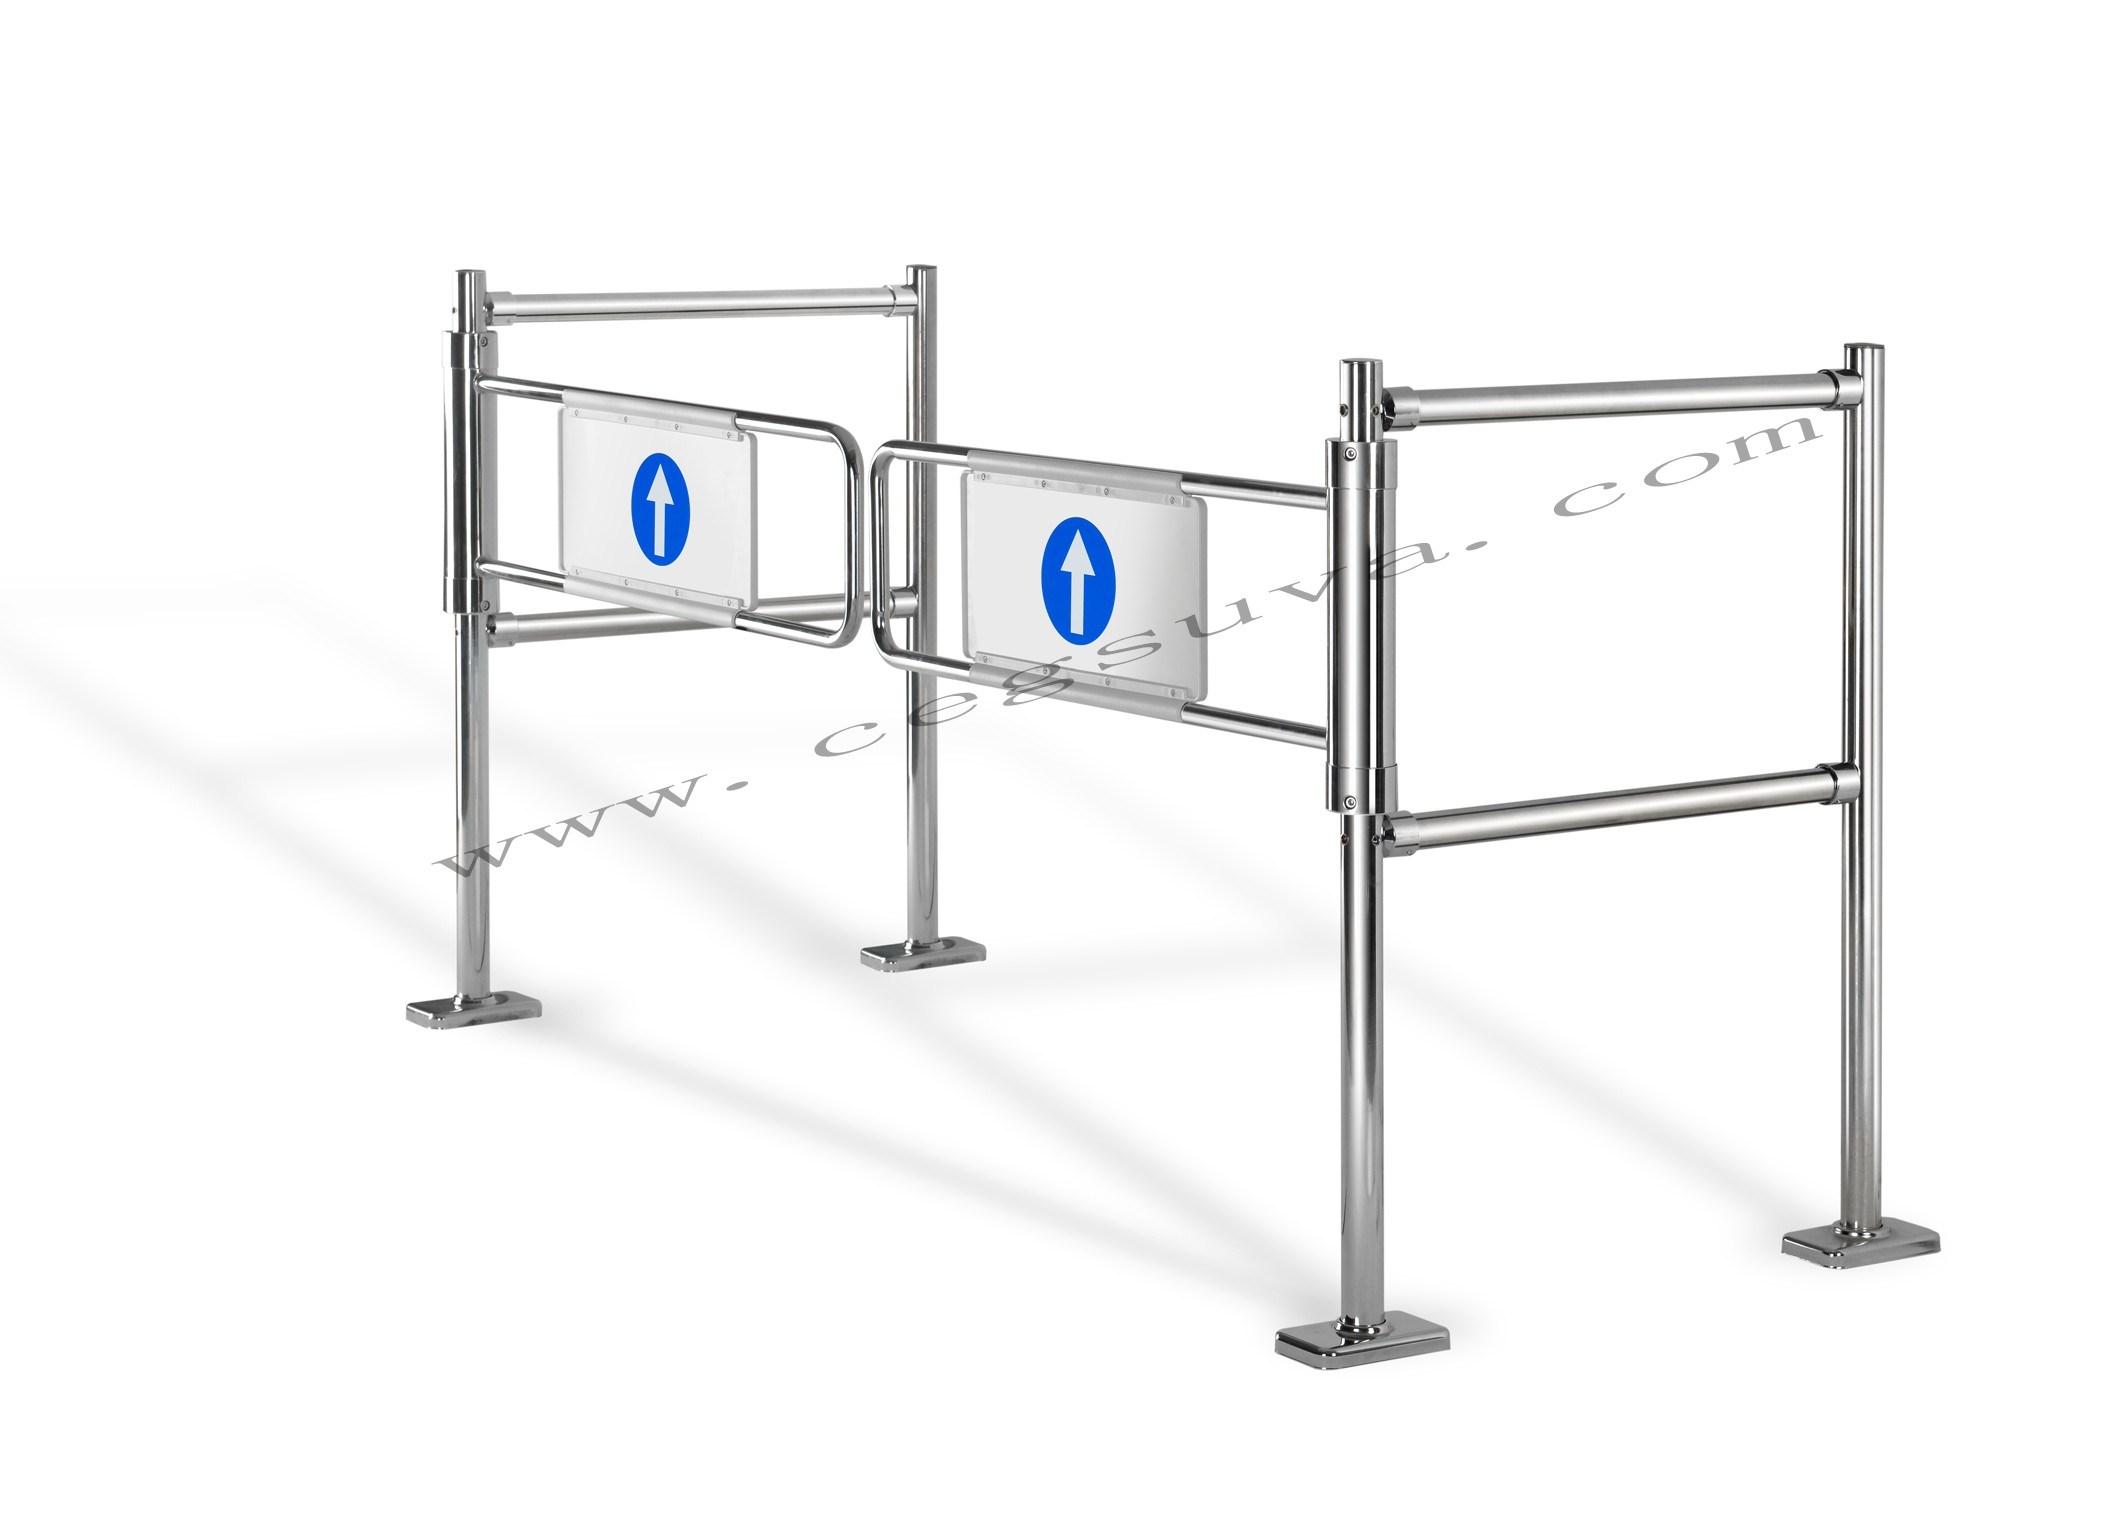 Dual Mechanical Gate Supermarket Gate, Swing Gate, Entrance Gates, Barrier Gate, Gate Opener